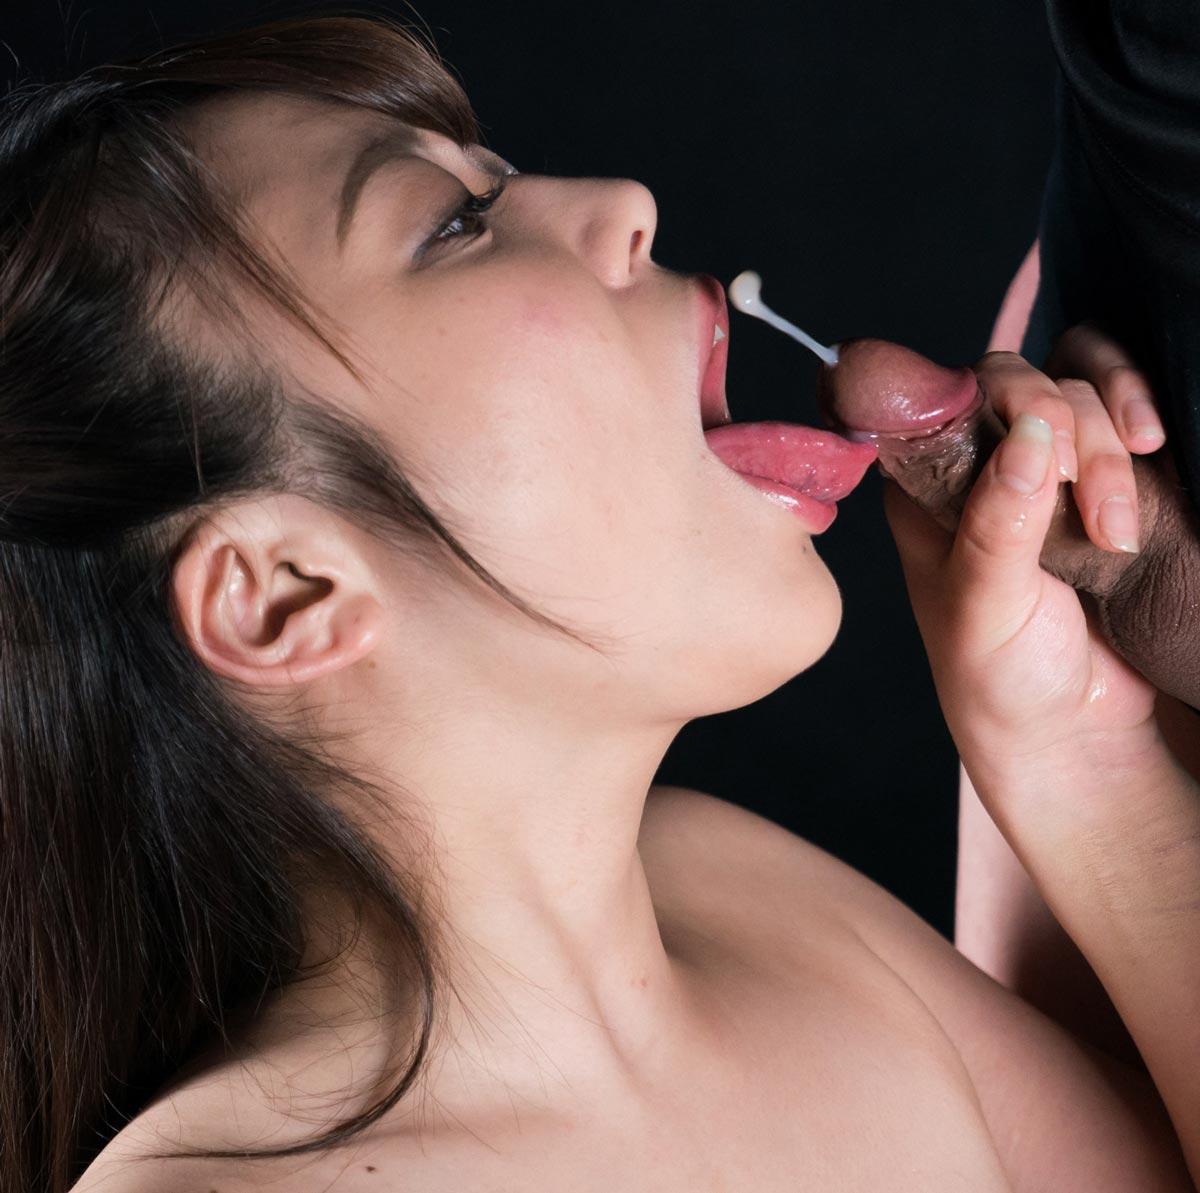 Yui Kawagoe's Cum Covered Group Handjob, A nude JAV Idol in an uncensored Sperm Mania video.